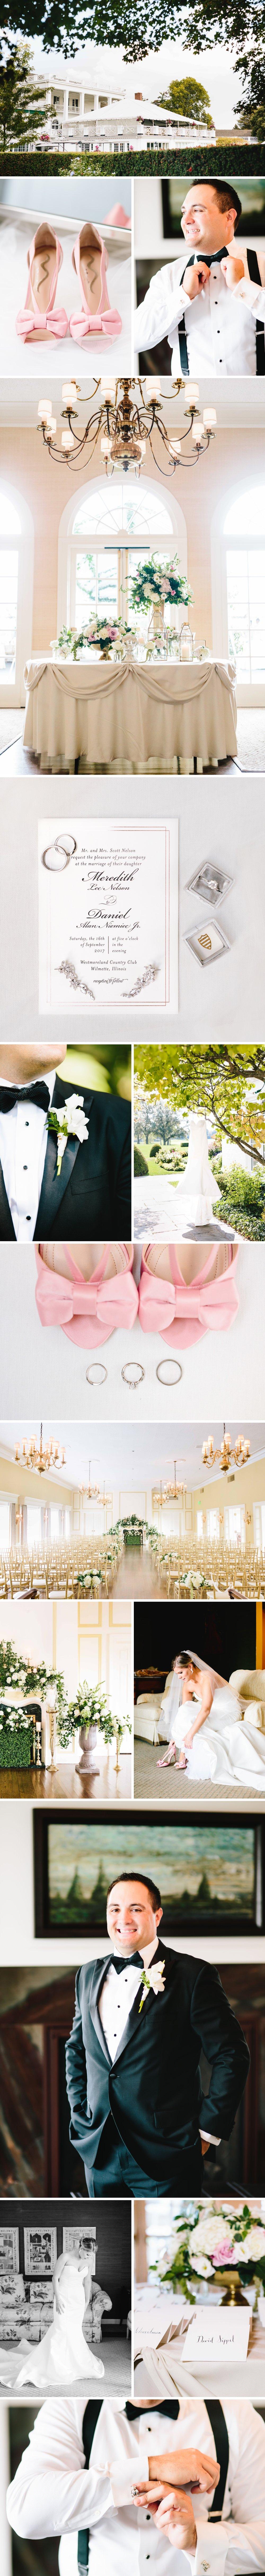 chicago-fine-art-wedding-photography-niemiec1